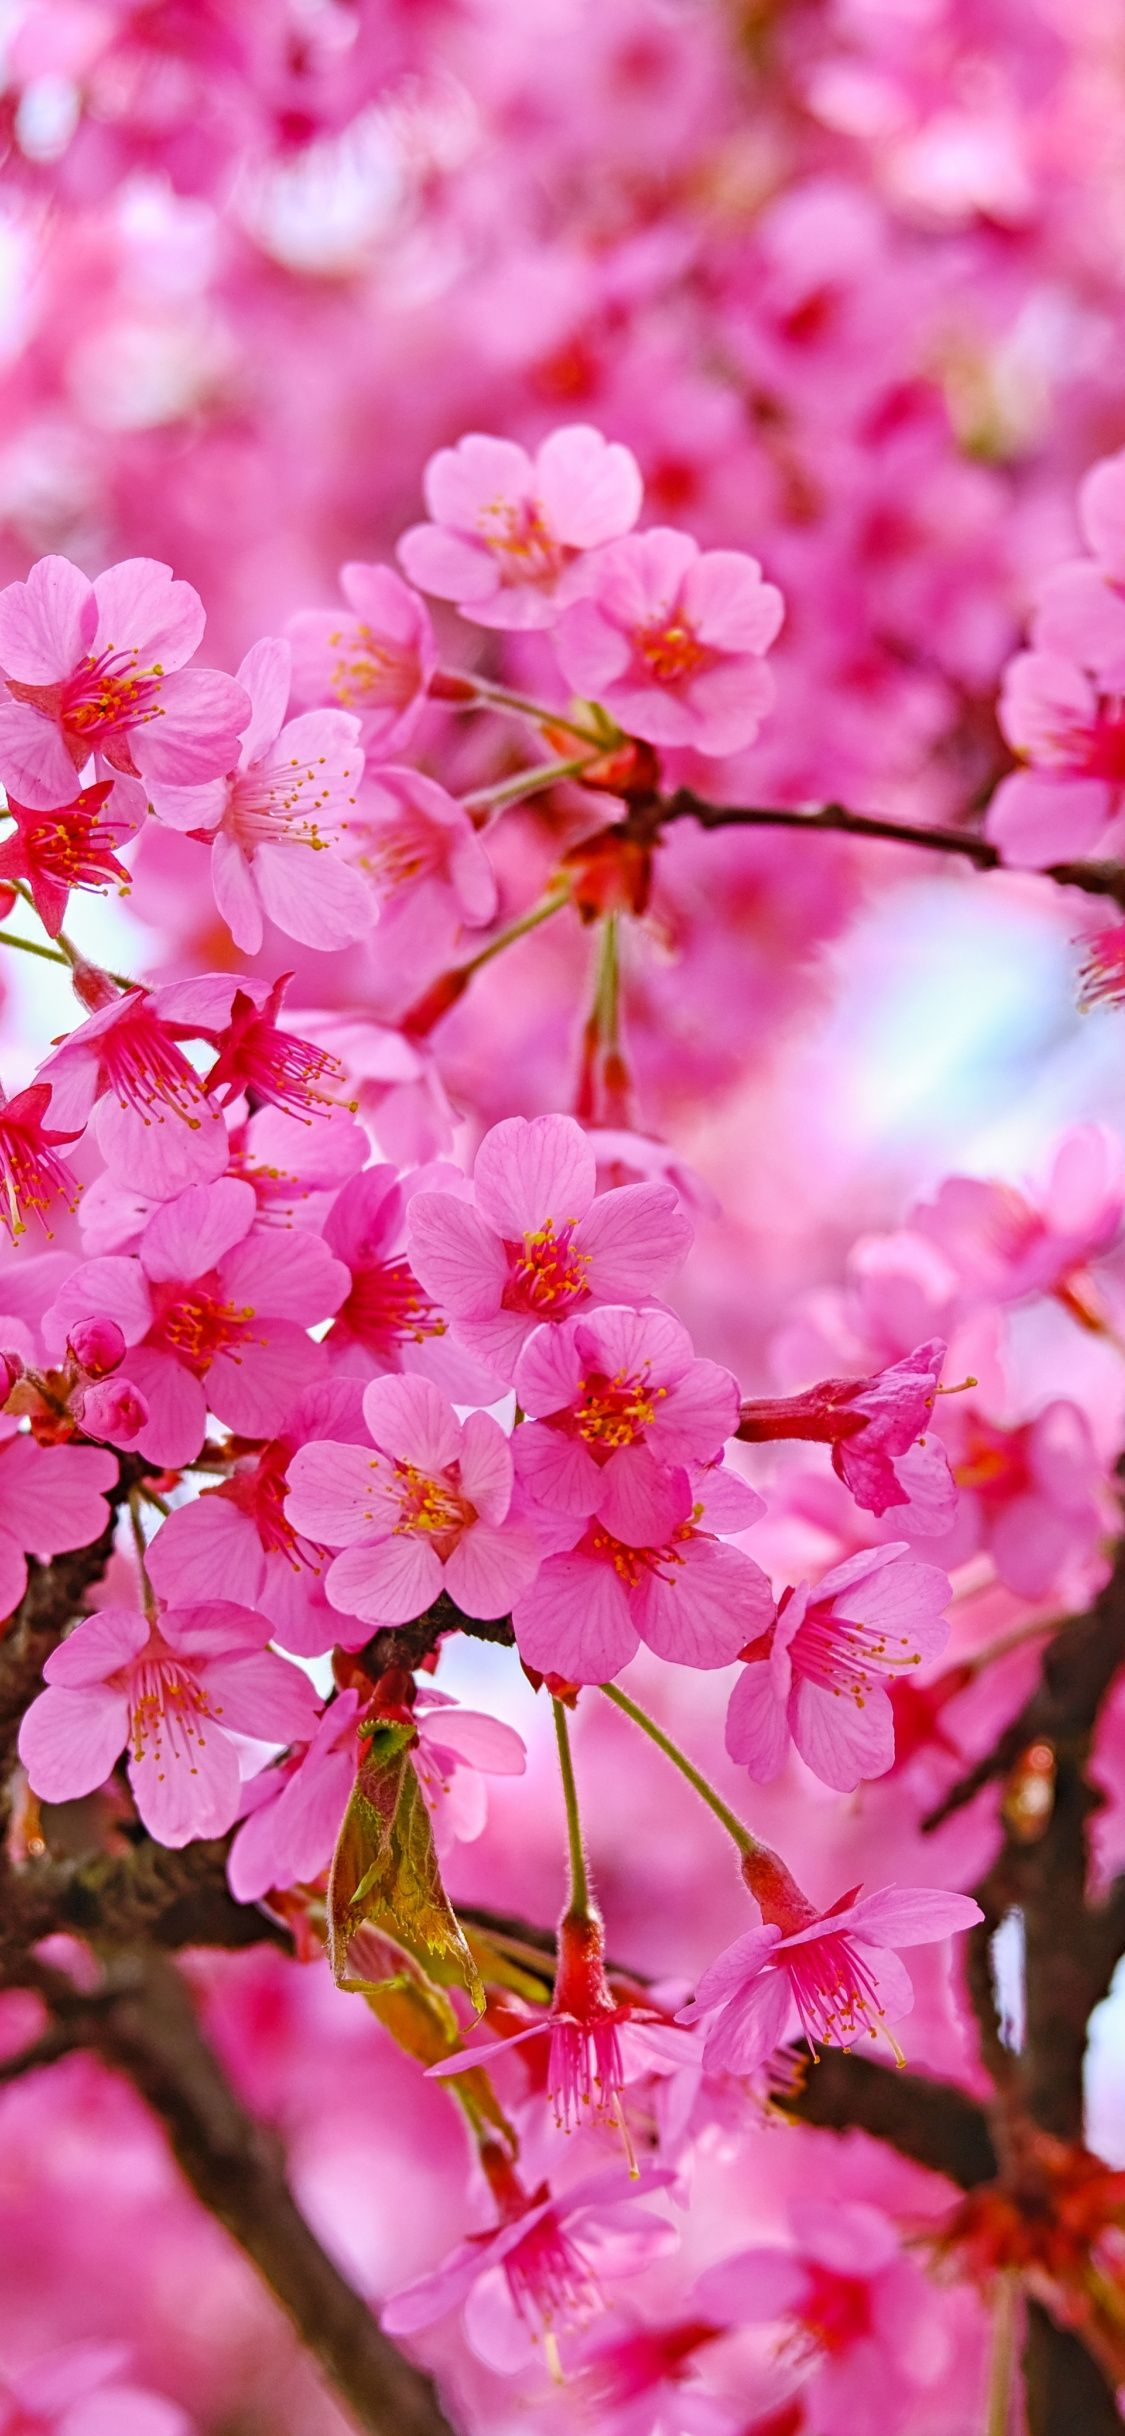 1125x2436 Cherry Blossom Pink Flowers Nature Wallpaper Cherry Blossom Wallpaper Iphone Beautiful Flowers Wallpapers Cherry Blossom Wallpaper